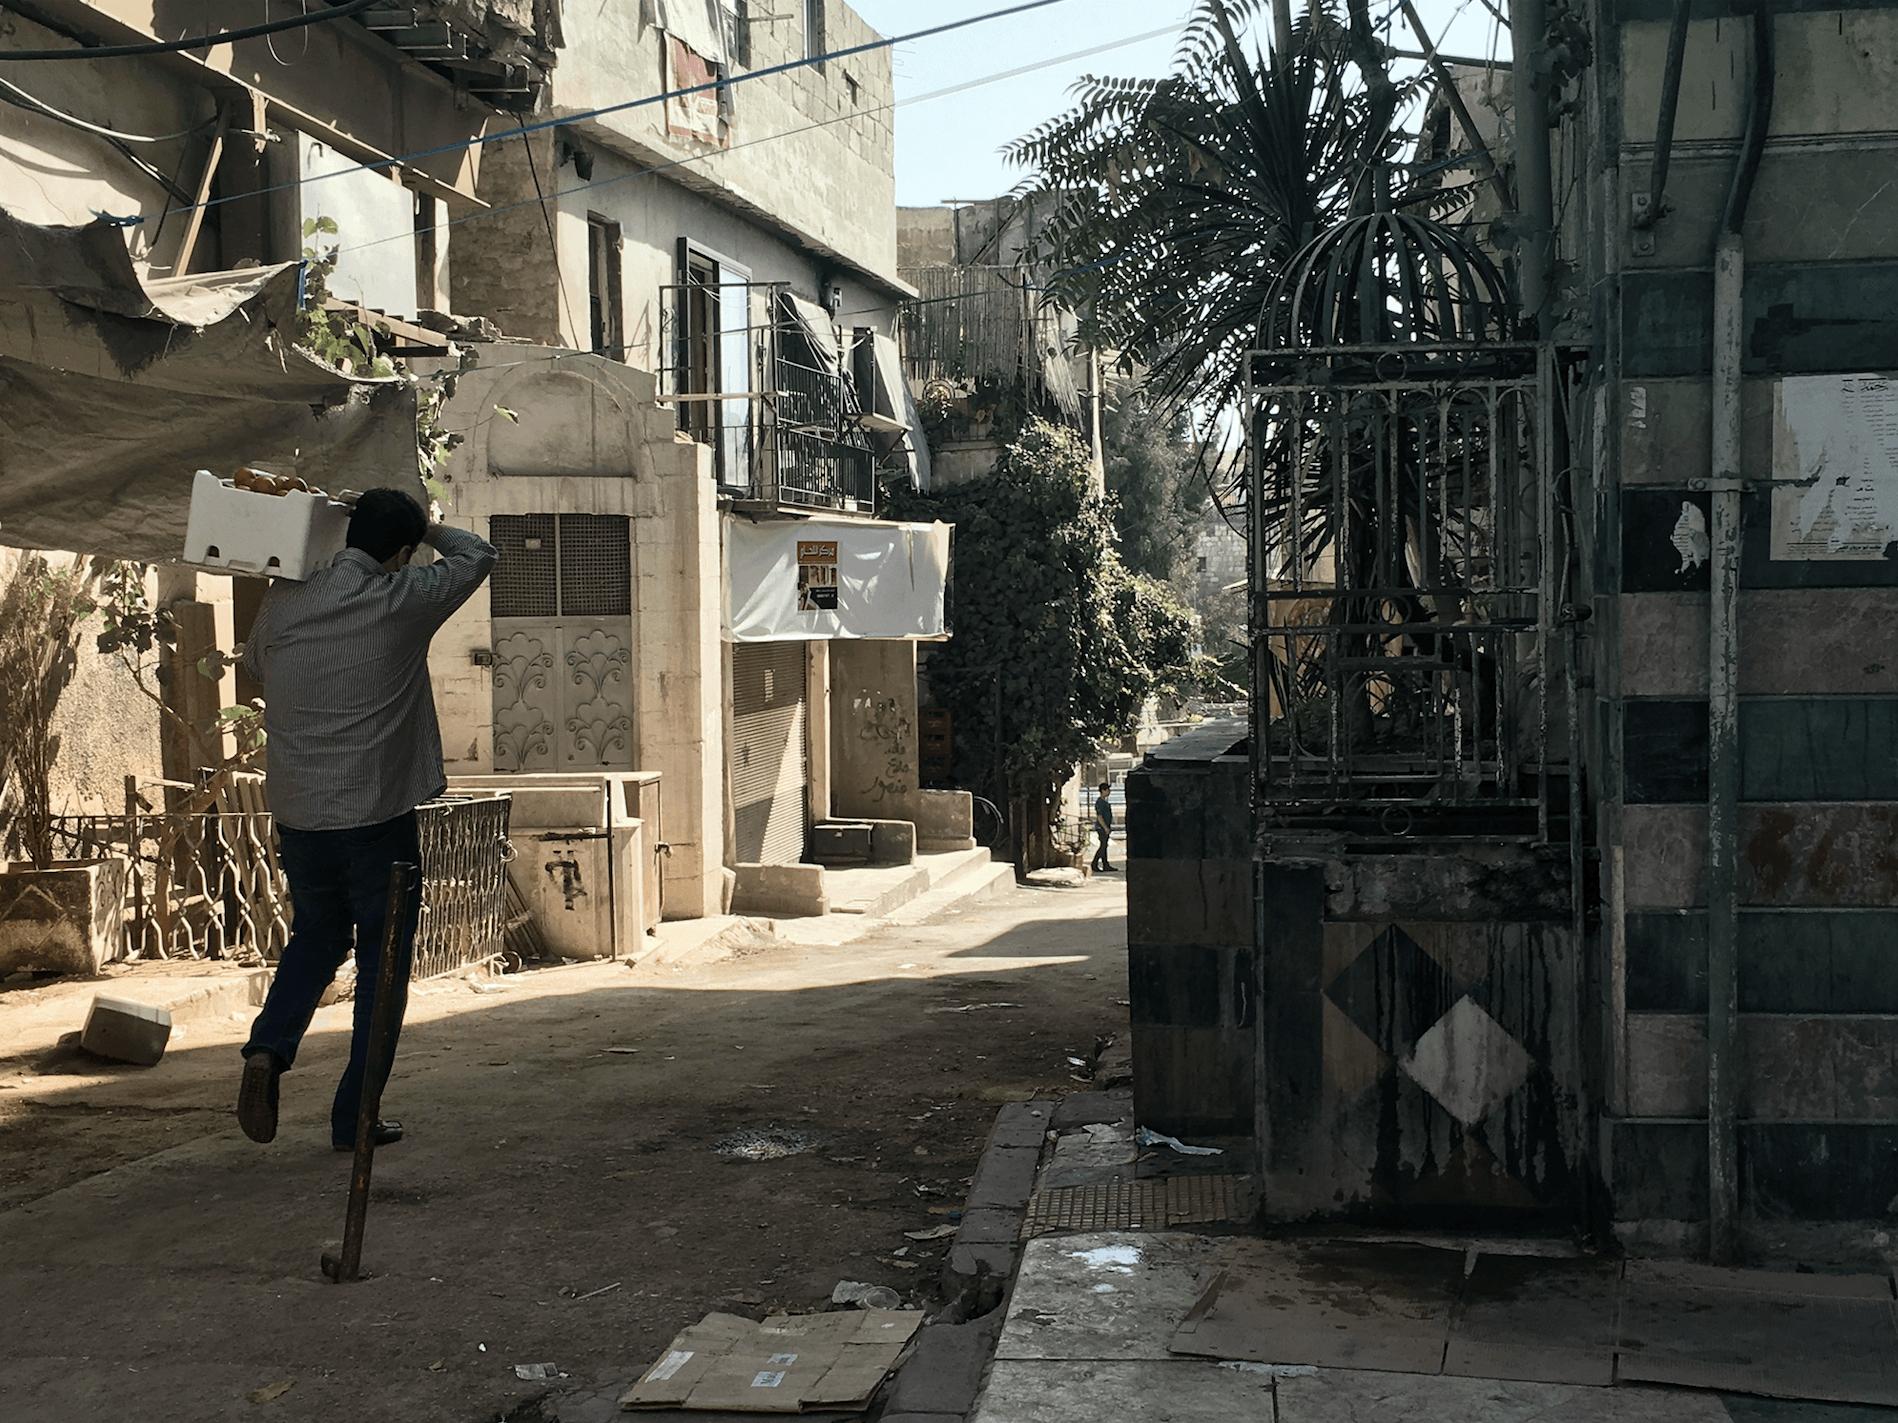 Día de mercado en Damasco / Laura Lavinia